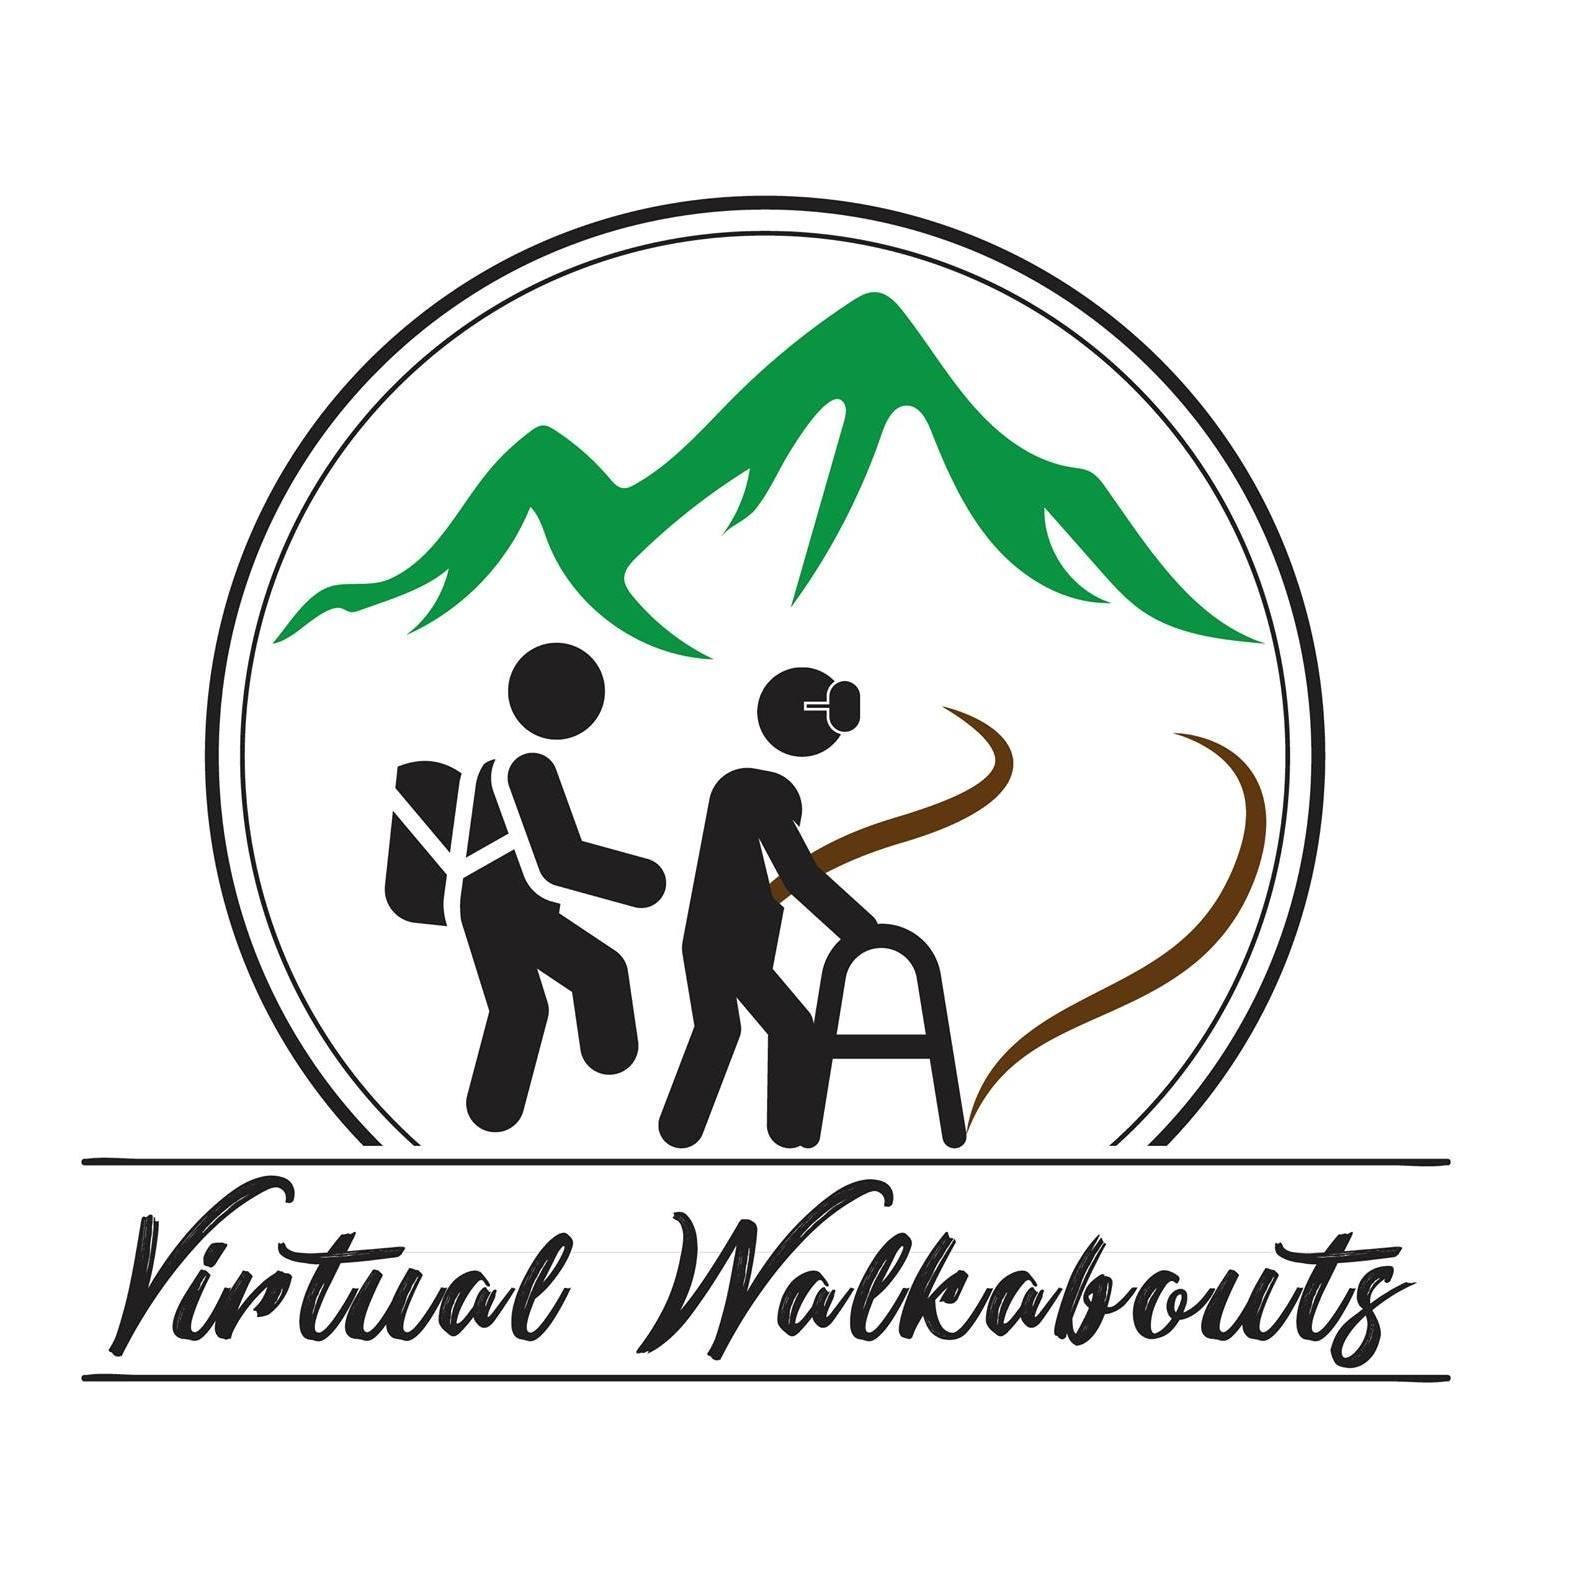 Virtual Walkabouts company logo